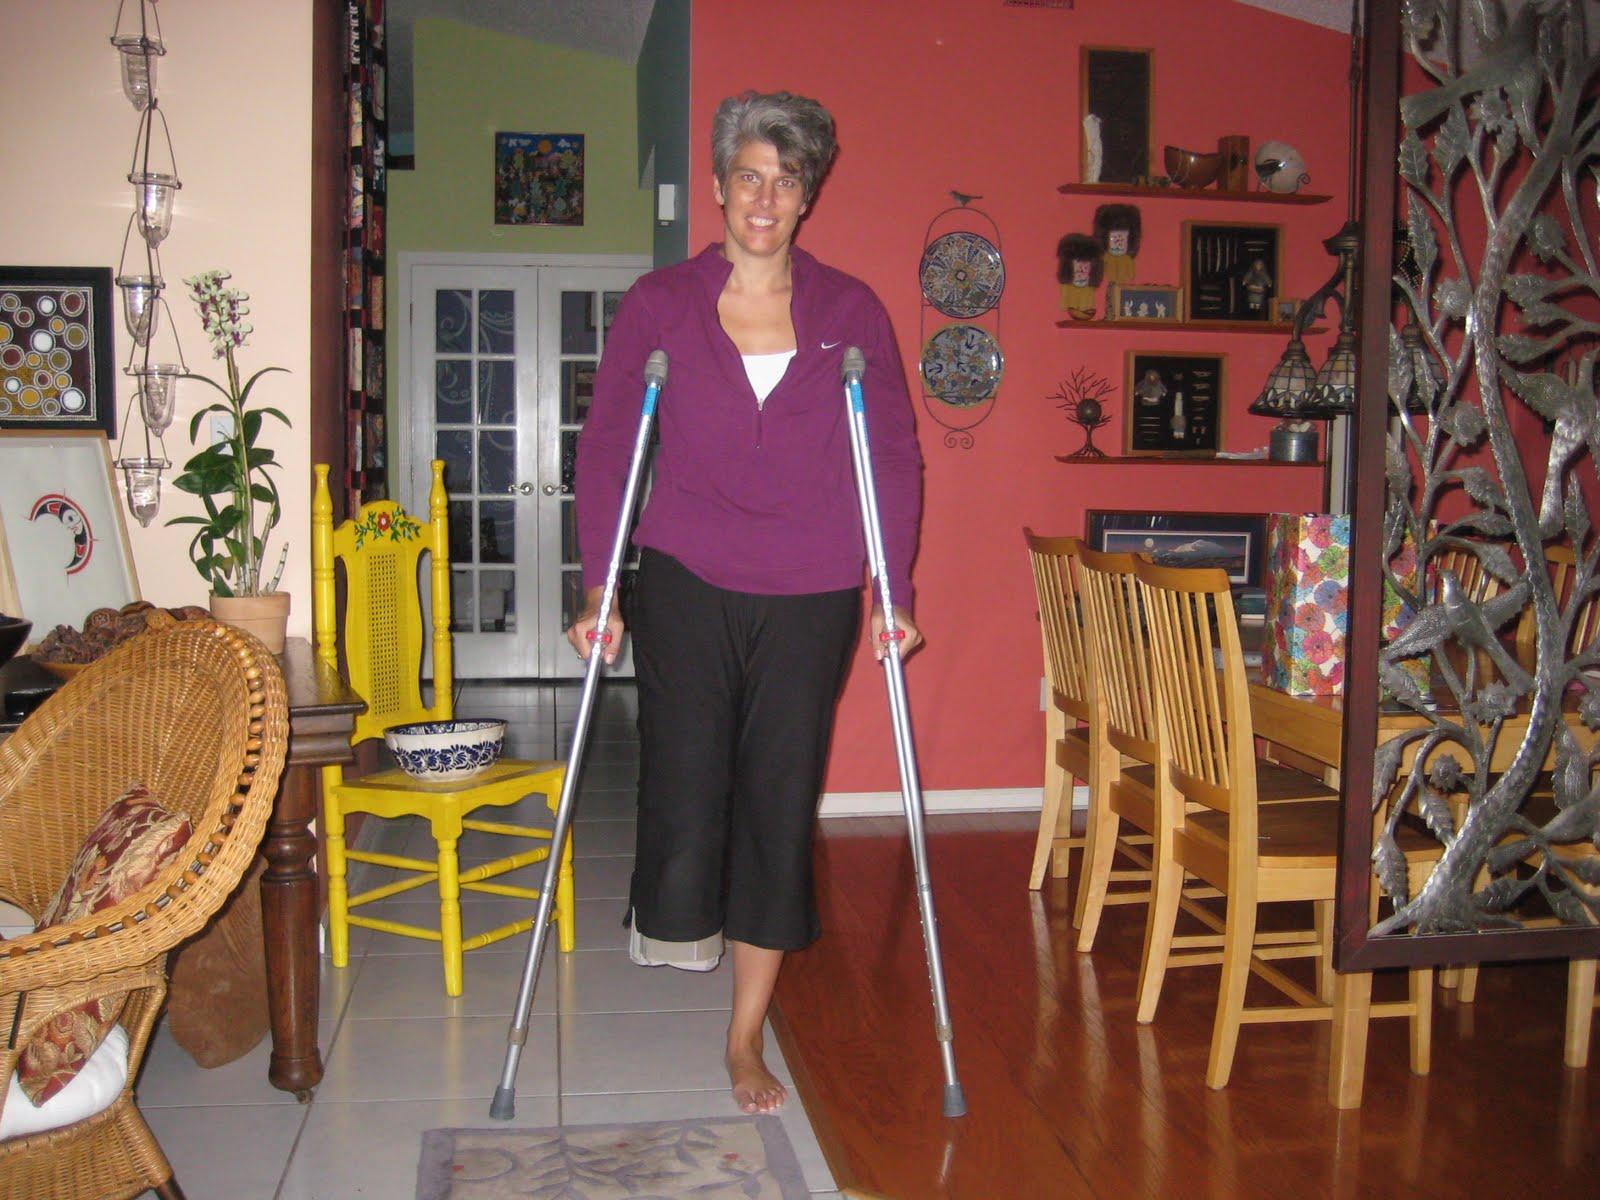 Women with Leg Amputee Short Stumps